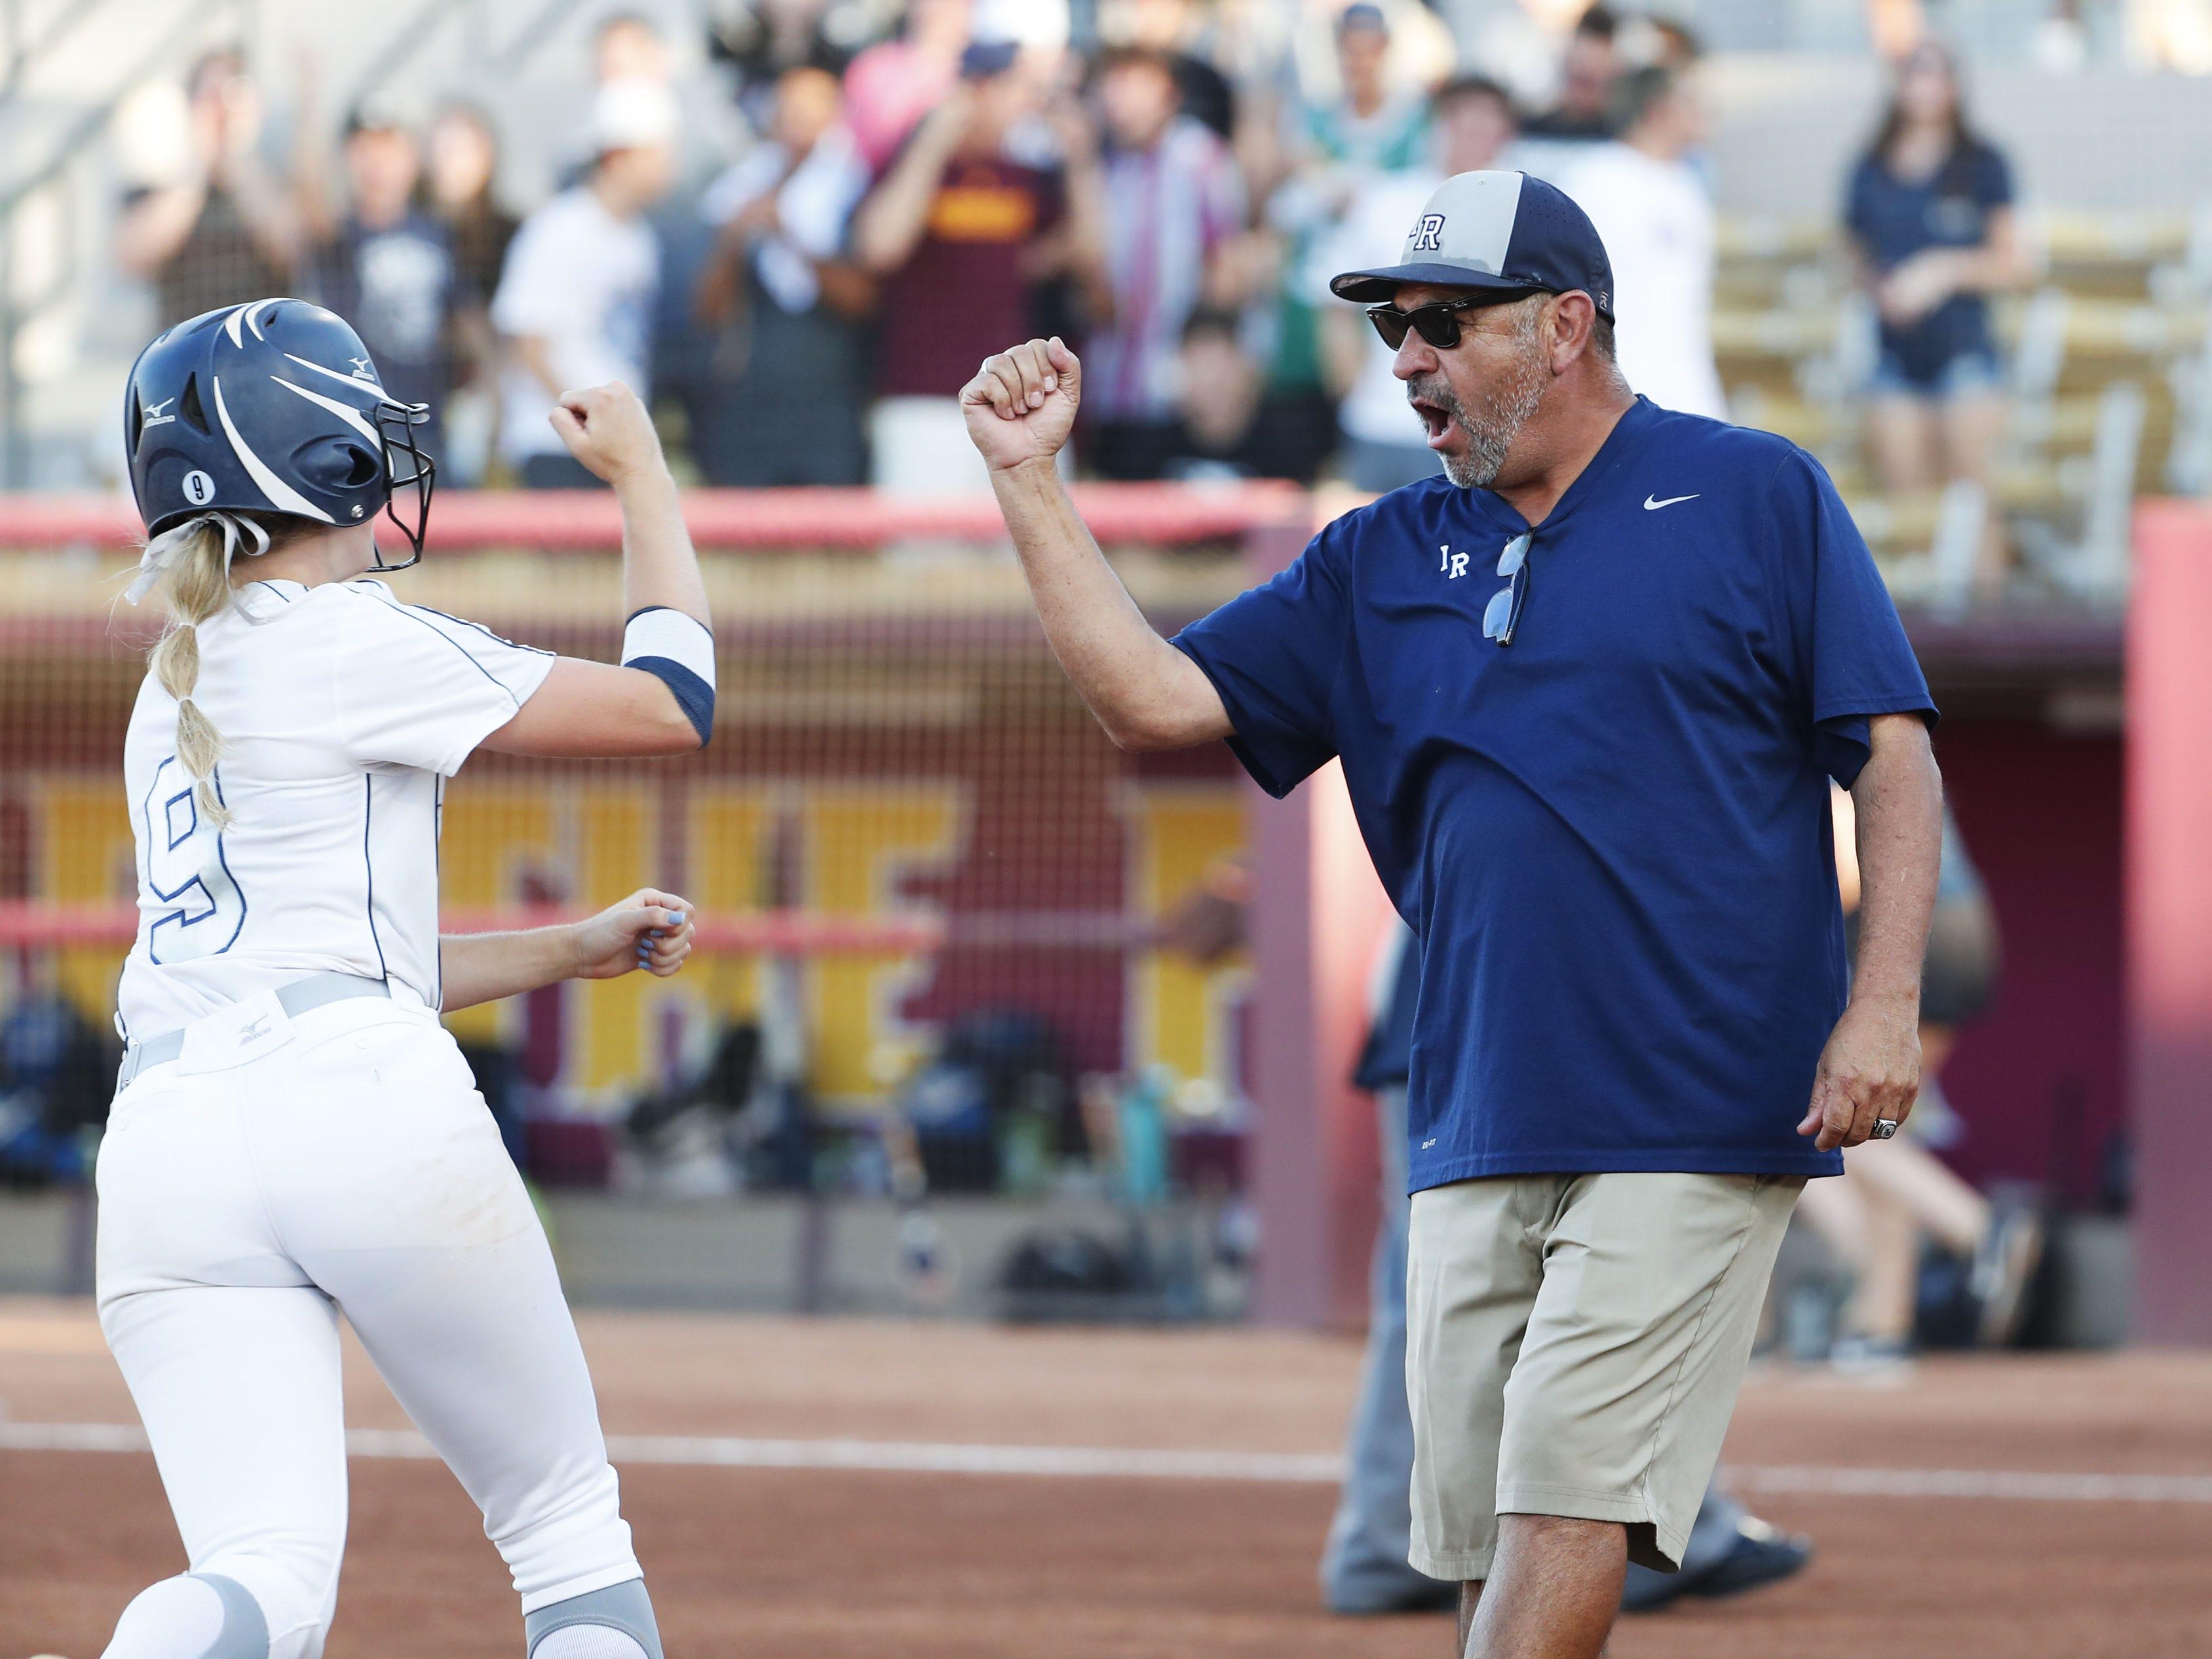 Ironwood Ridge head coach David Martinez congratulates Diana Nisbett (9) on her solo home run against Centennial during the 5A State Softball Championship in Tempe, Ariz. May 13, 2019.